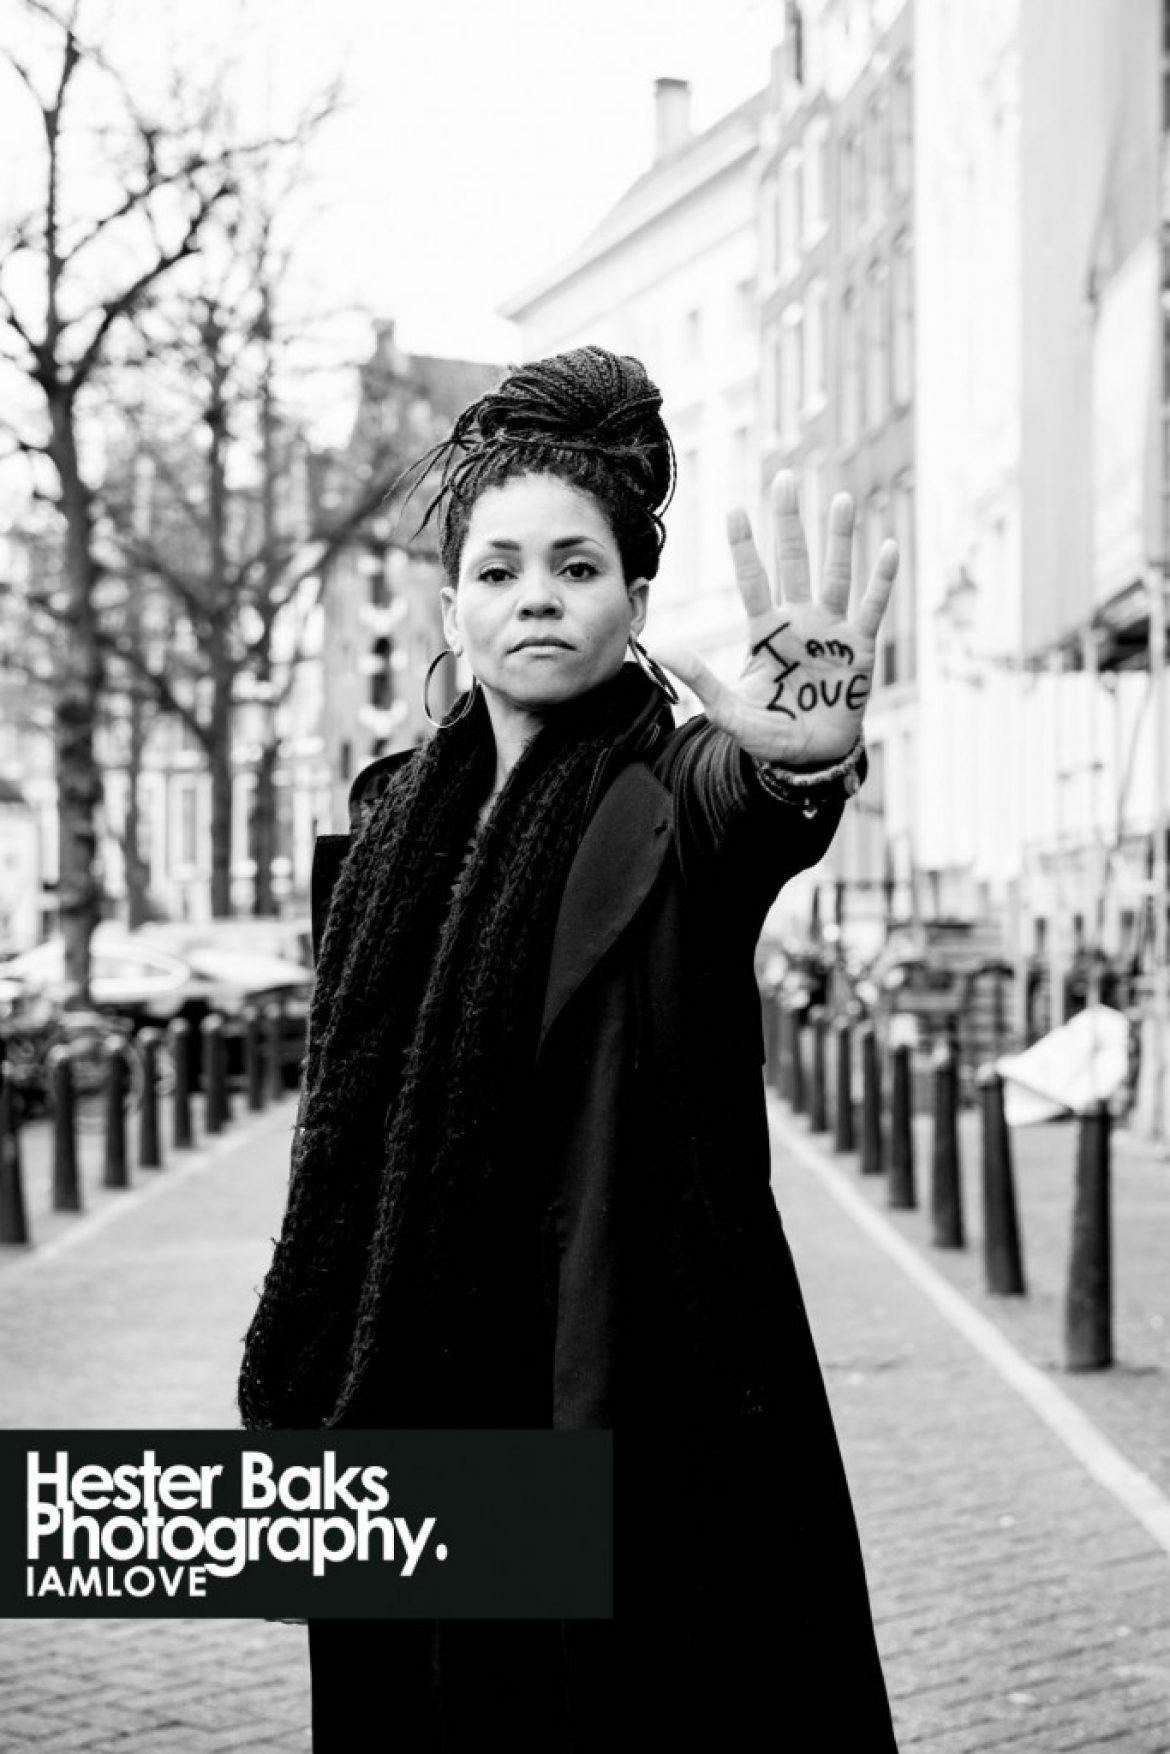 "Join the movement "" I AM LOVE""  https://www.facebook.com/iamlove2015 #iamlove #blackandwhite #streetphotography"